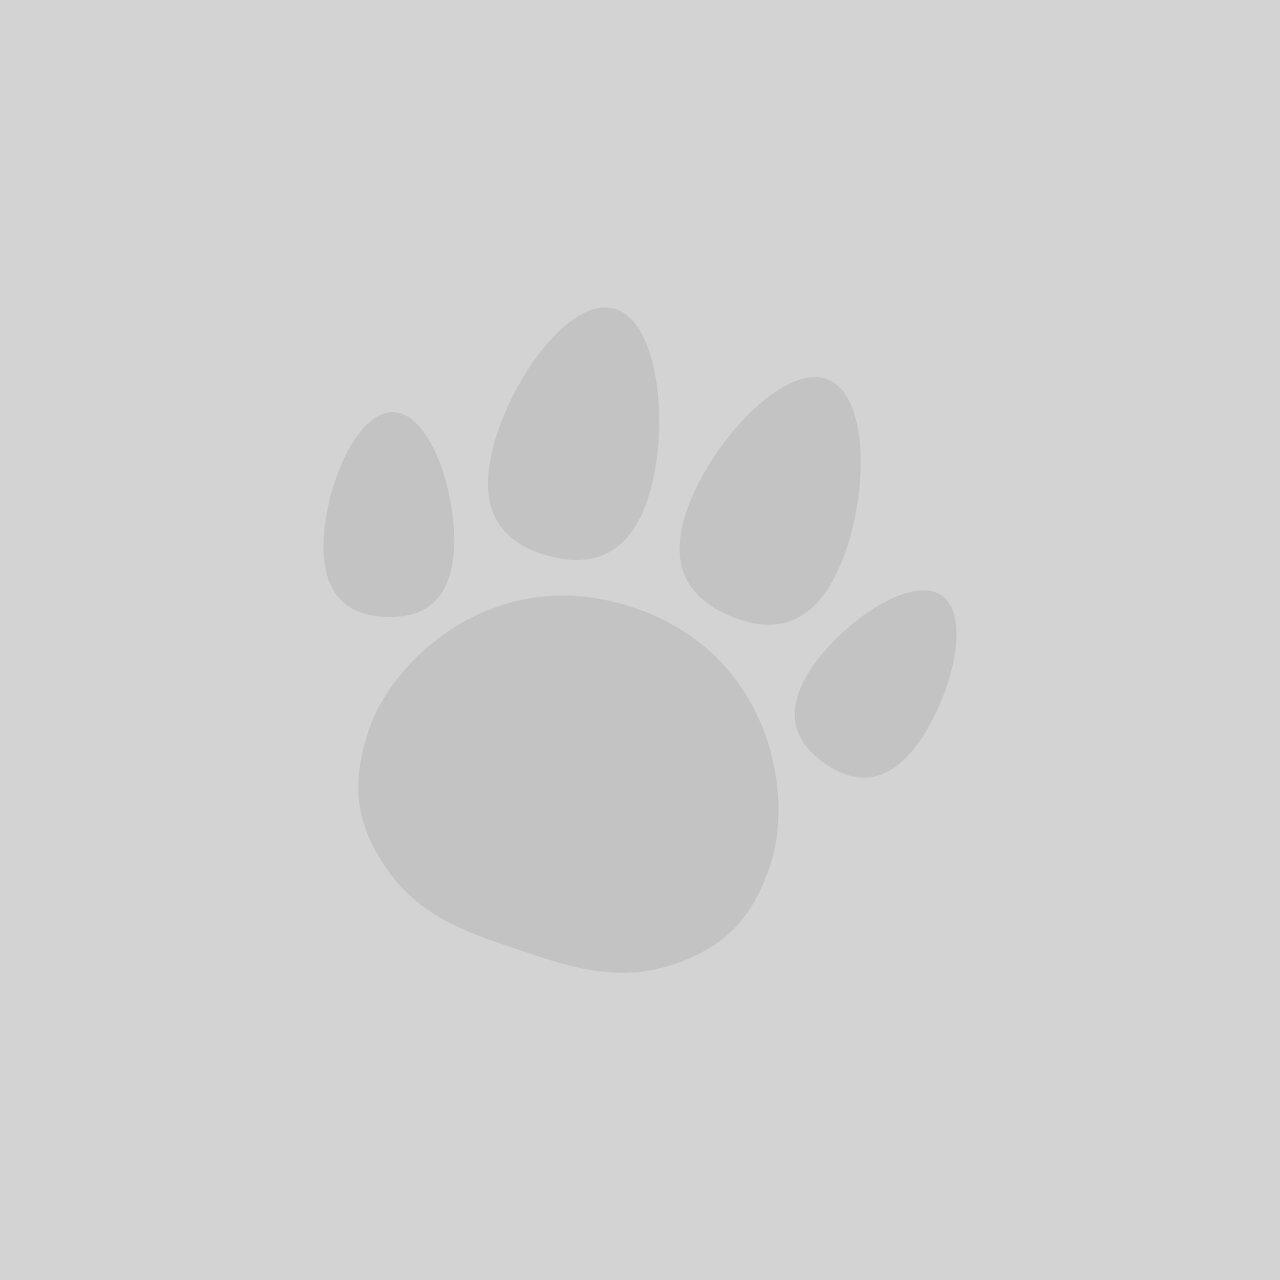 FURminator for Dogs with Long Hair - Medium